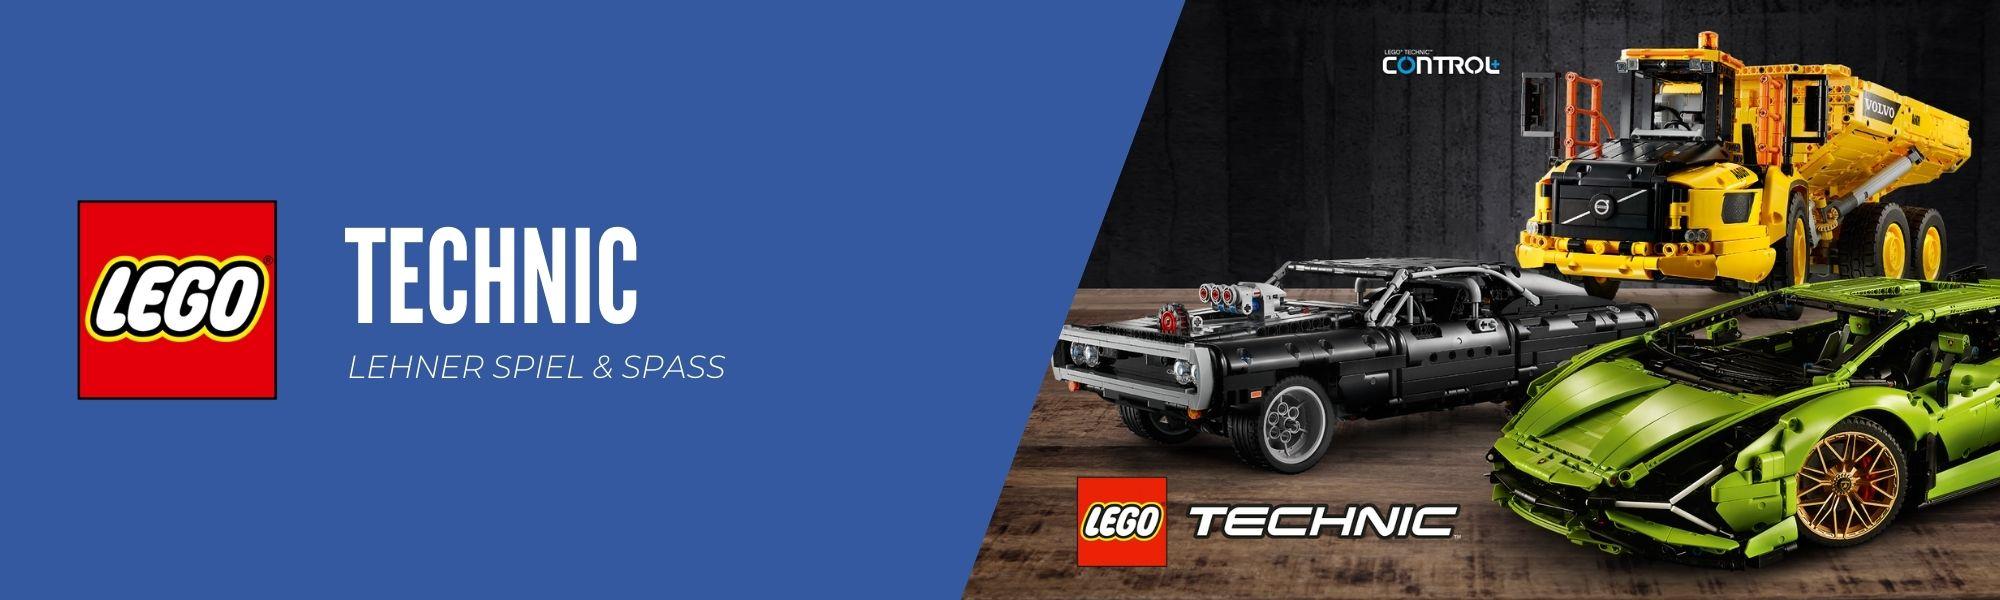 Lego Technic (1)